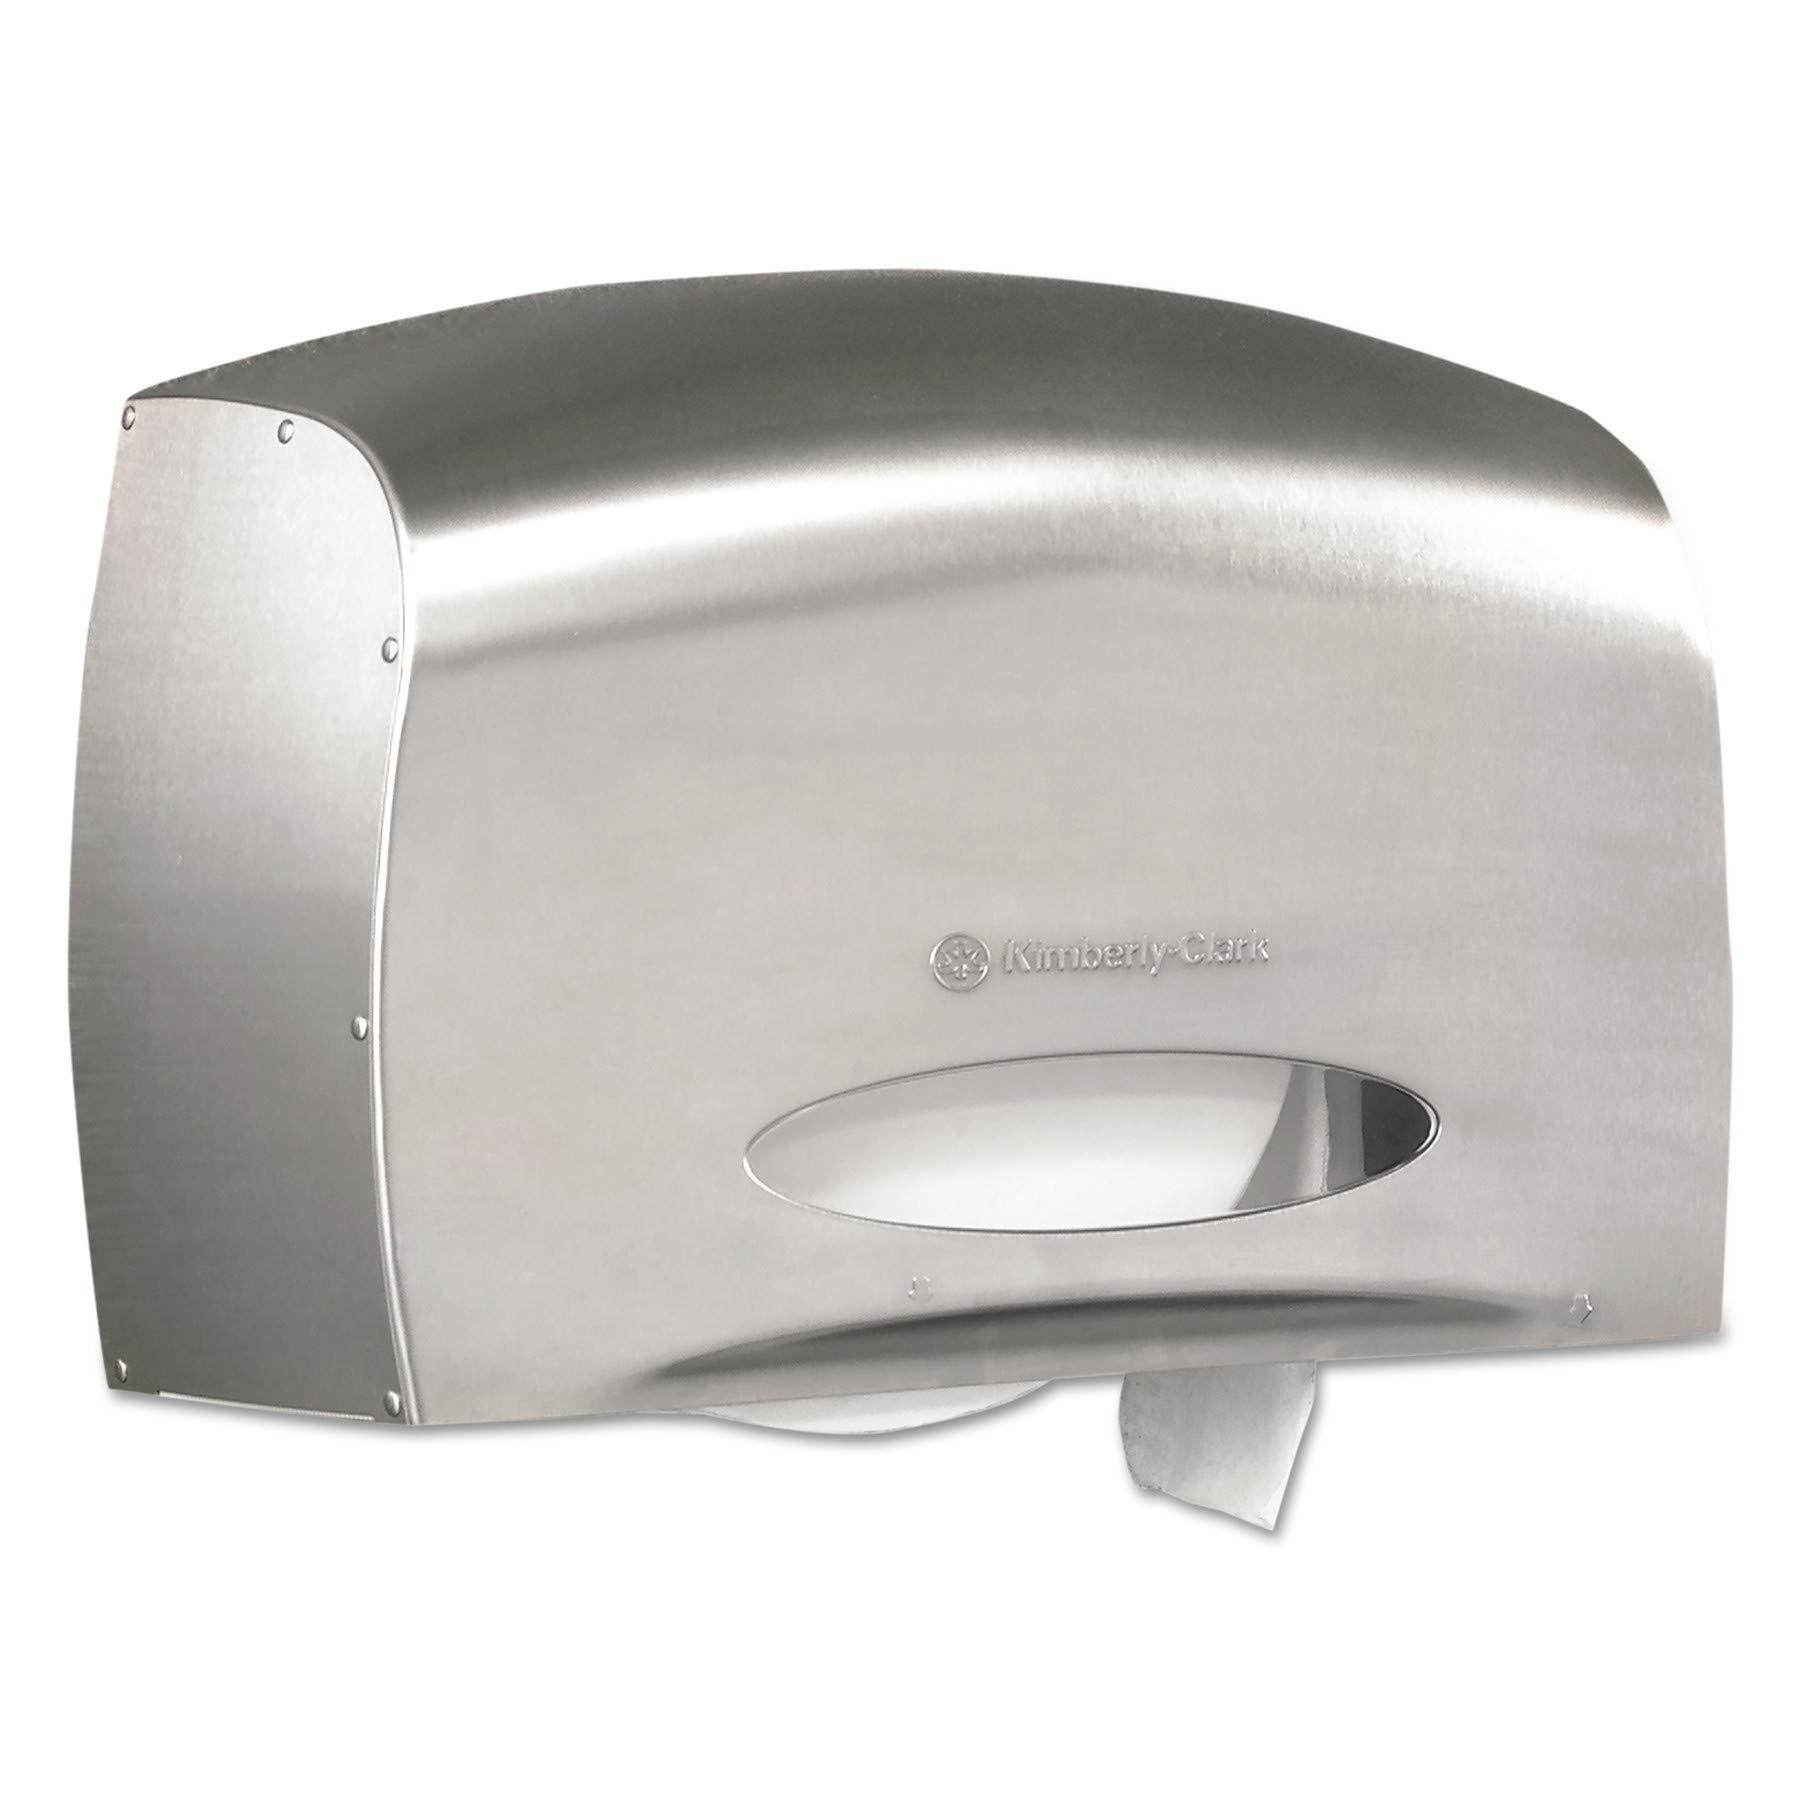 Kimberly-Clark Professional 09601 Coreless JRT Jr. Bath Tissue Dispenser, EZ Load, 6x9.8x14.3, Stainless Steel by Kimberly-Clark Professional